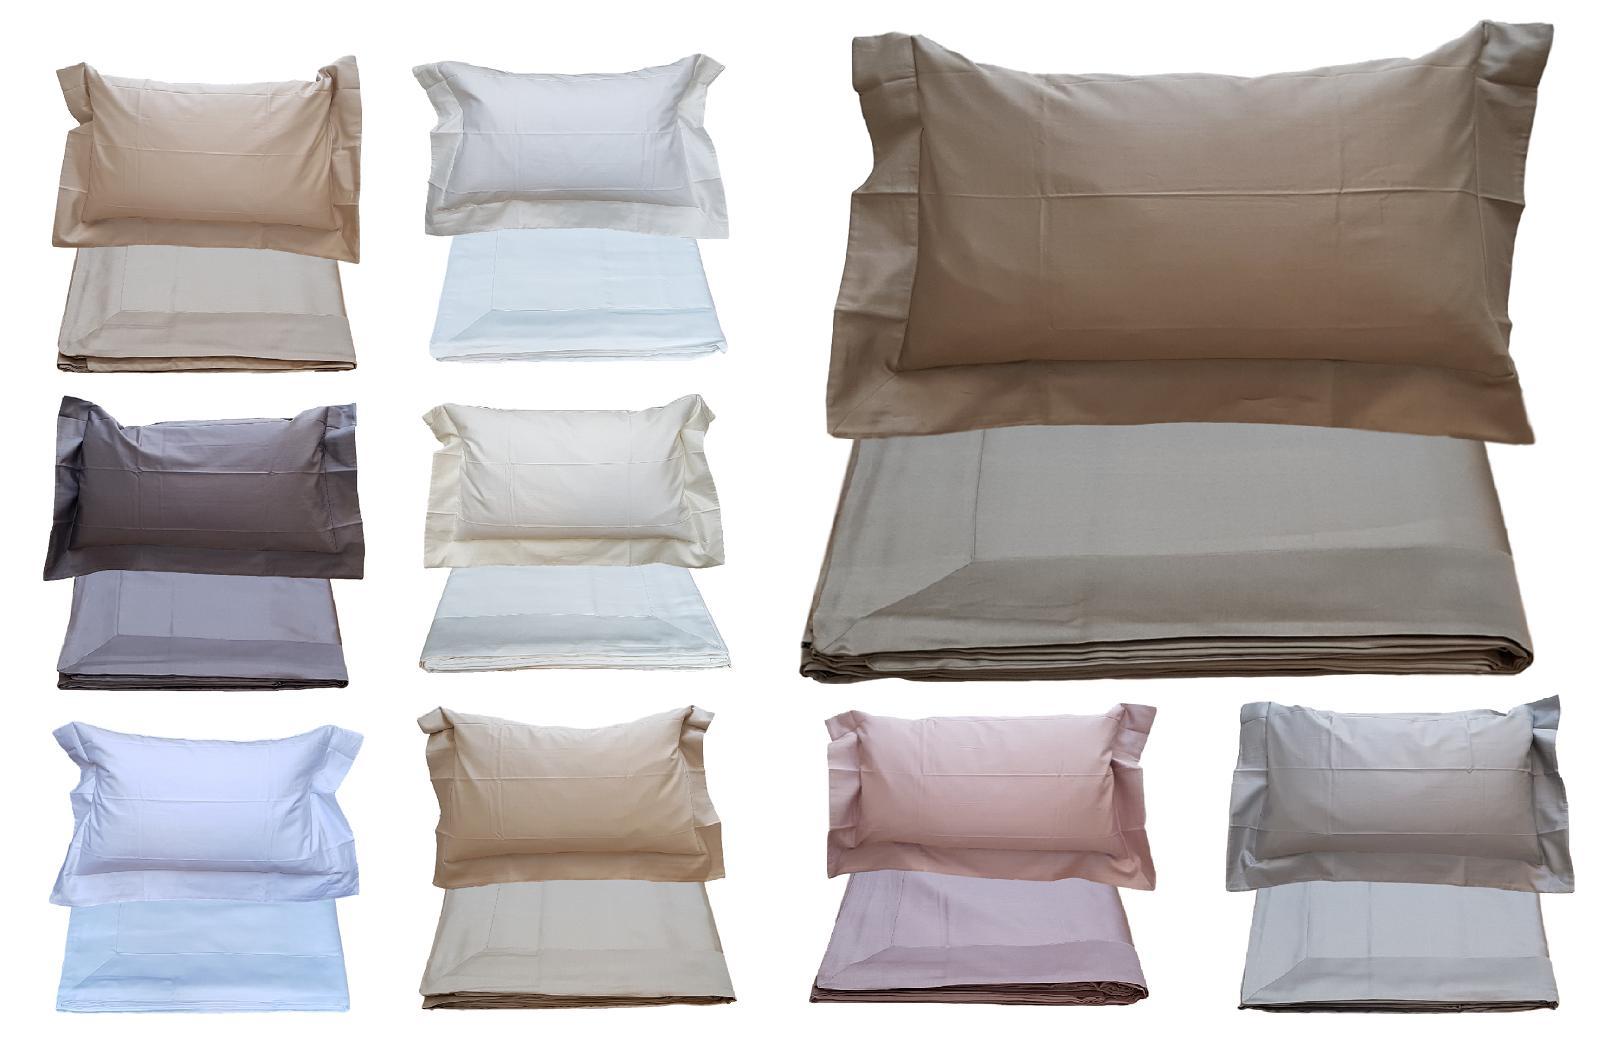 st sheets labuan satin cotton 100 percent